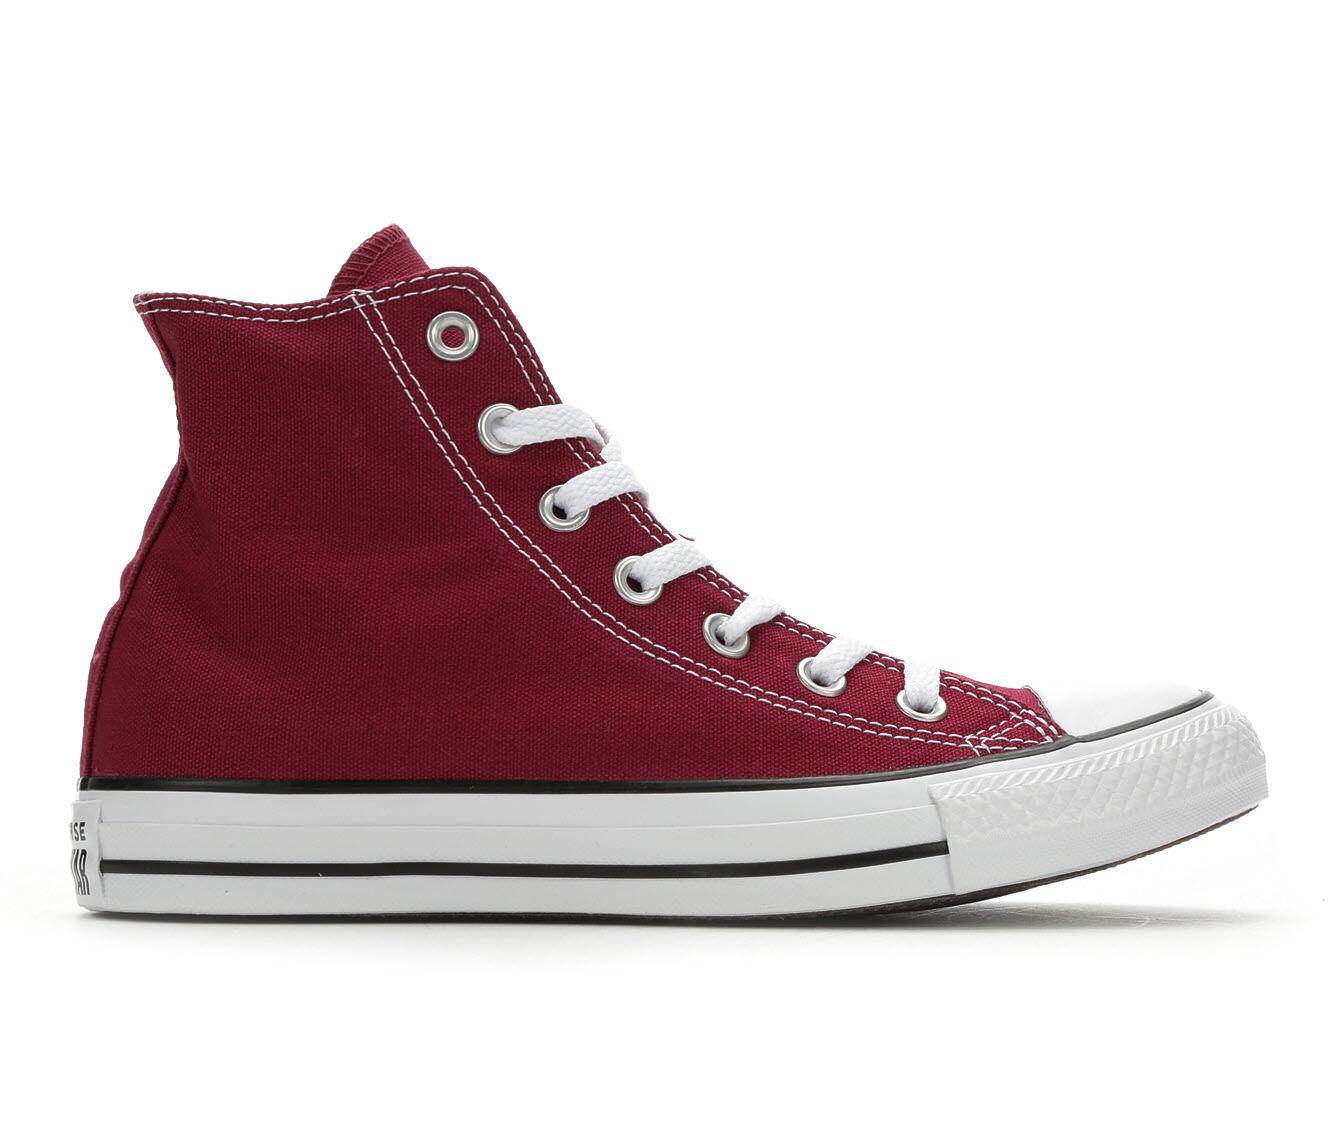 9b0d2e96c98f92 ... spain adults converse chuck taylor all star seasonal hi high top  sneakers shoe carnival 3f203 38cba ...